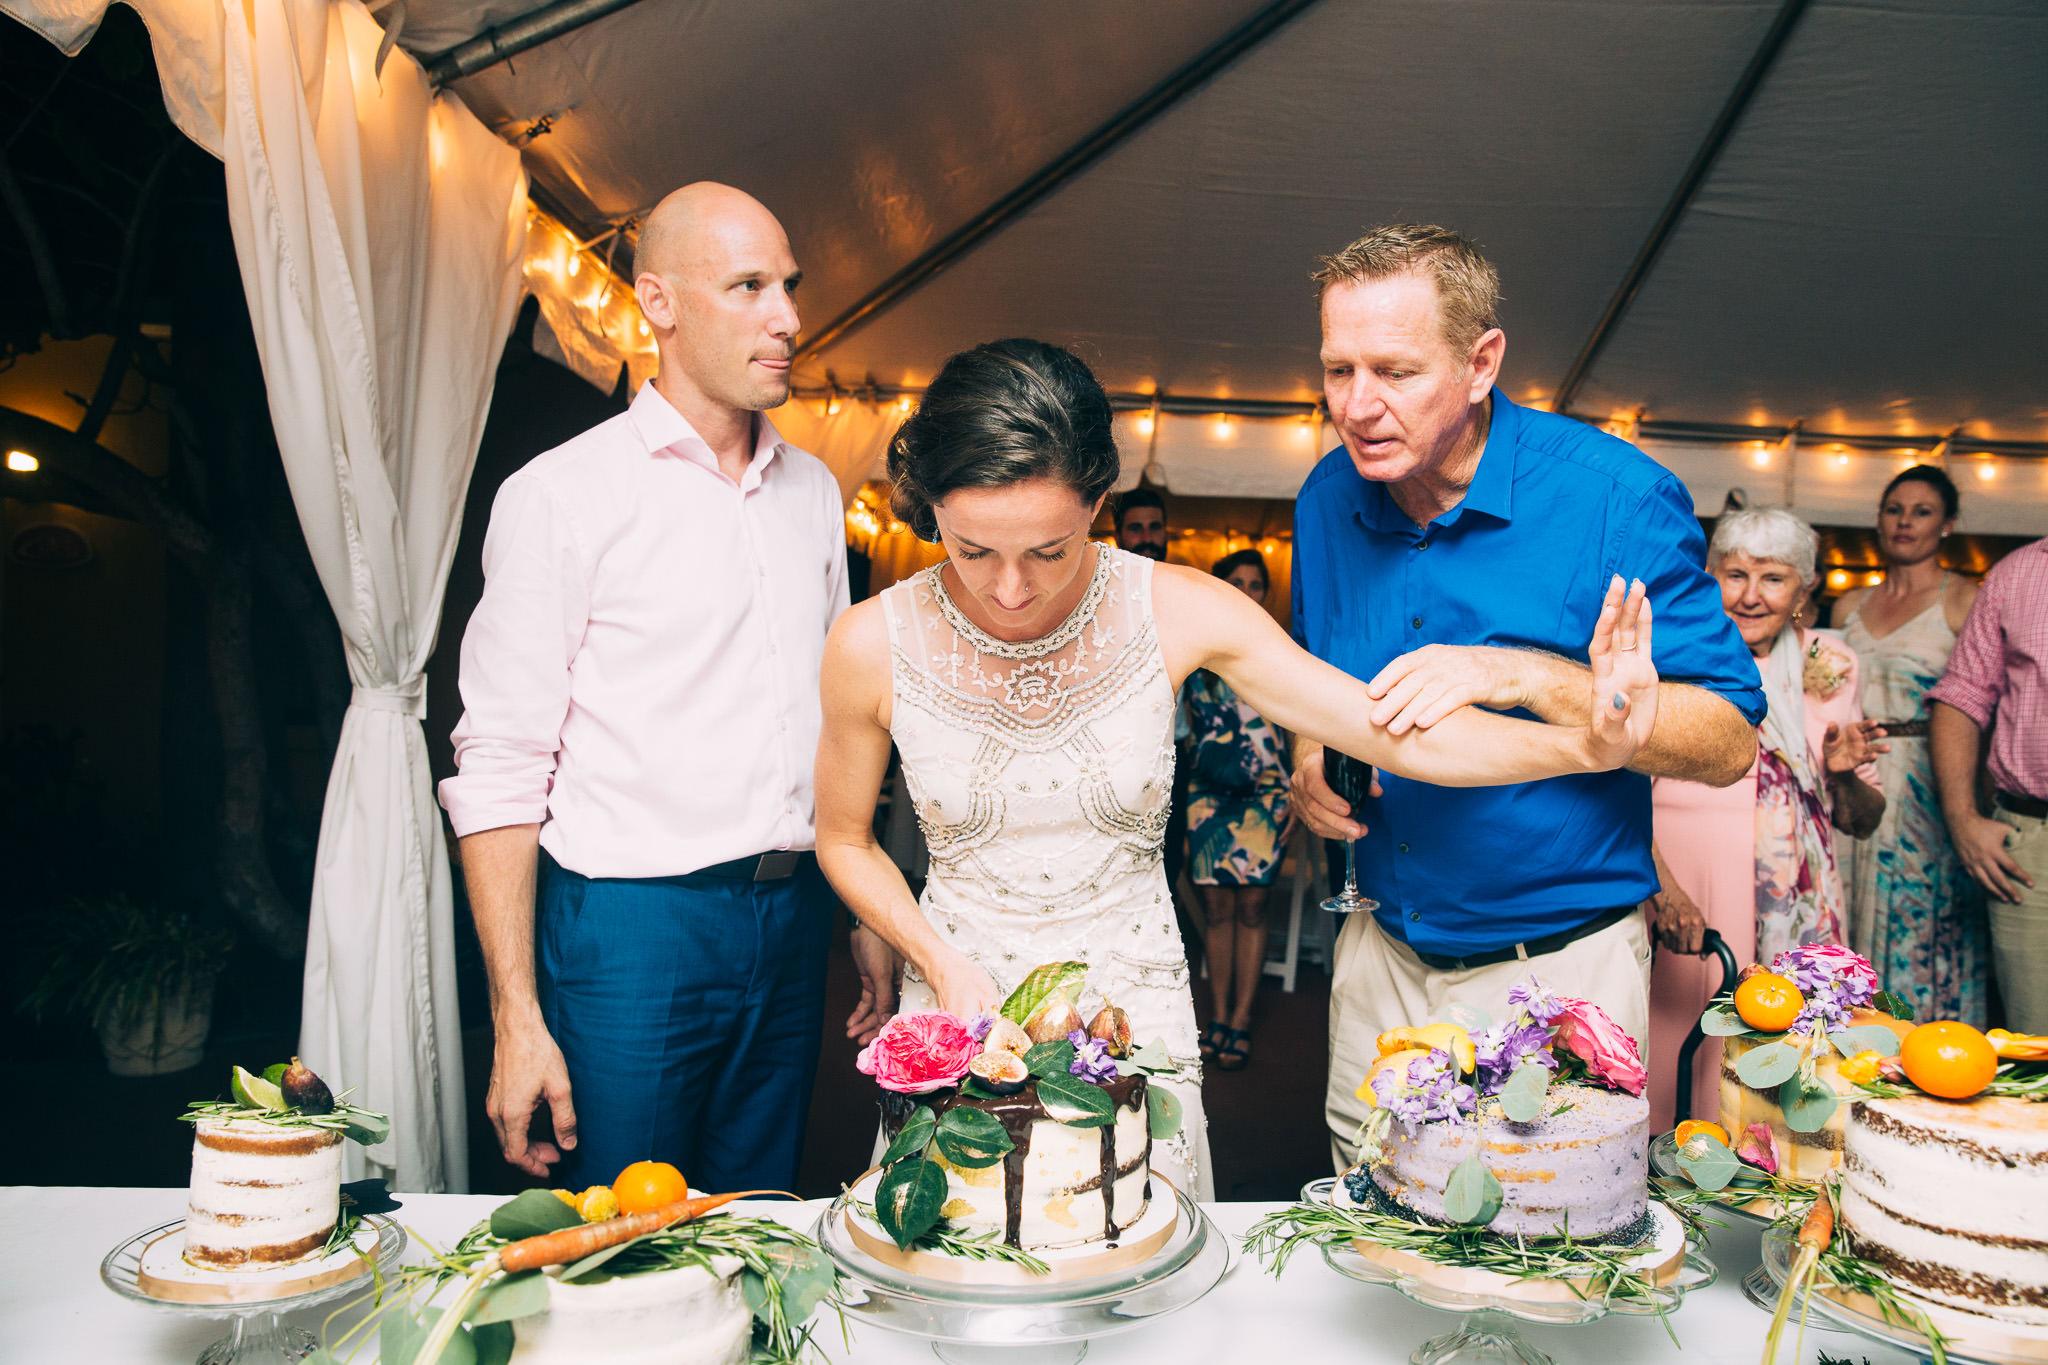 065_Canadian-destination-wedding-photogr